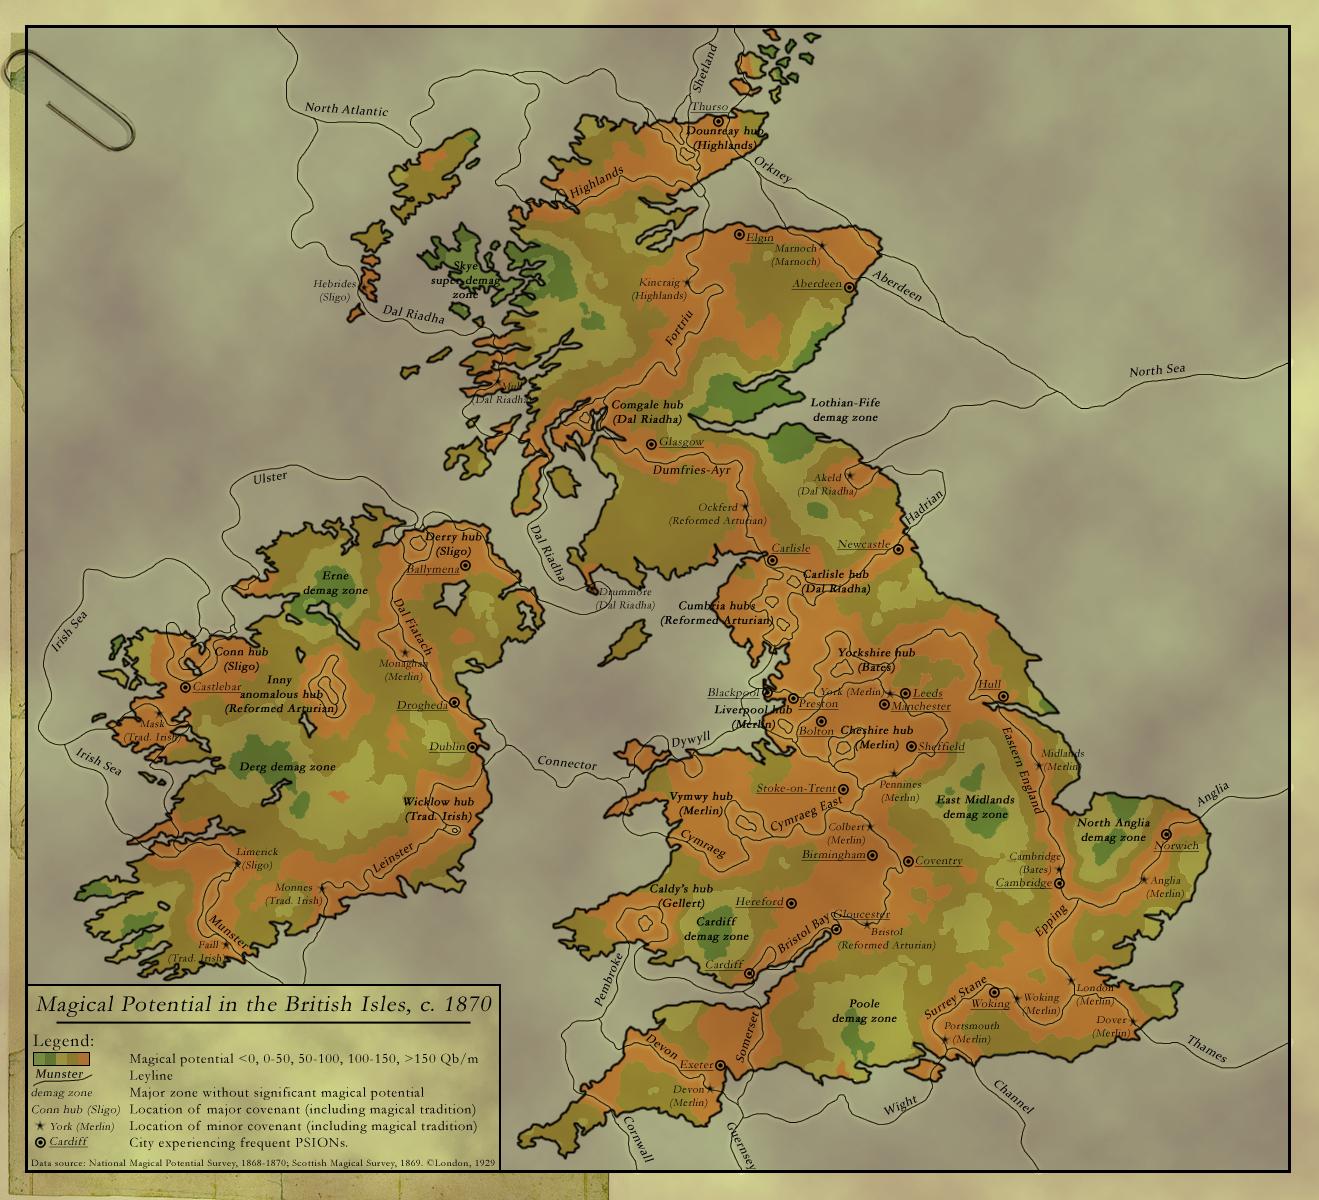 Magic in Britain by Laiqua-lasse